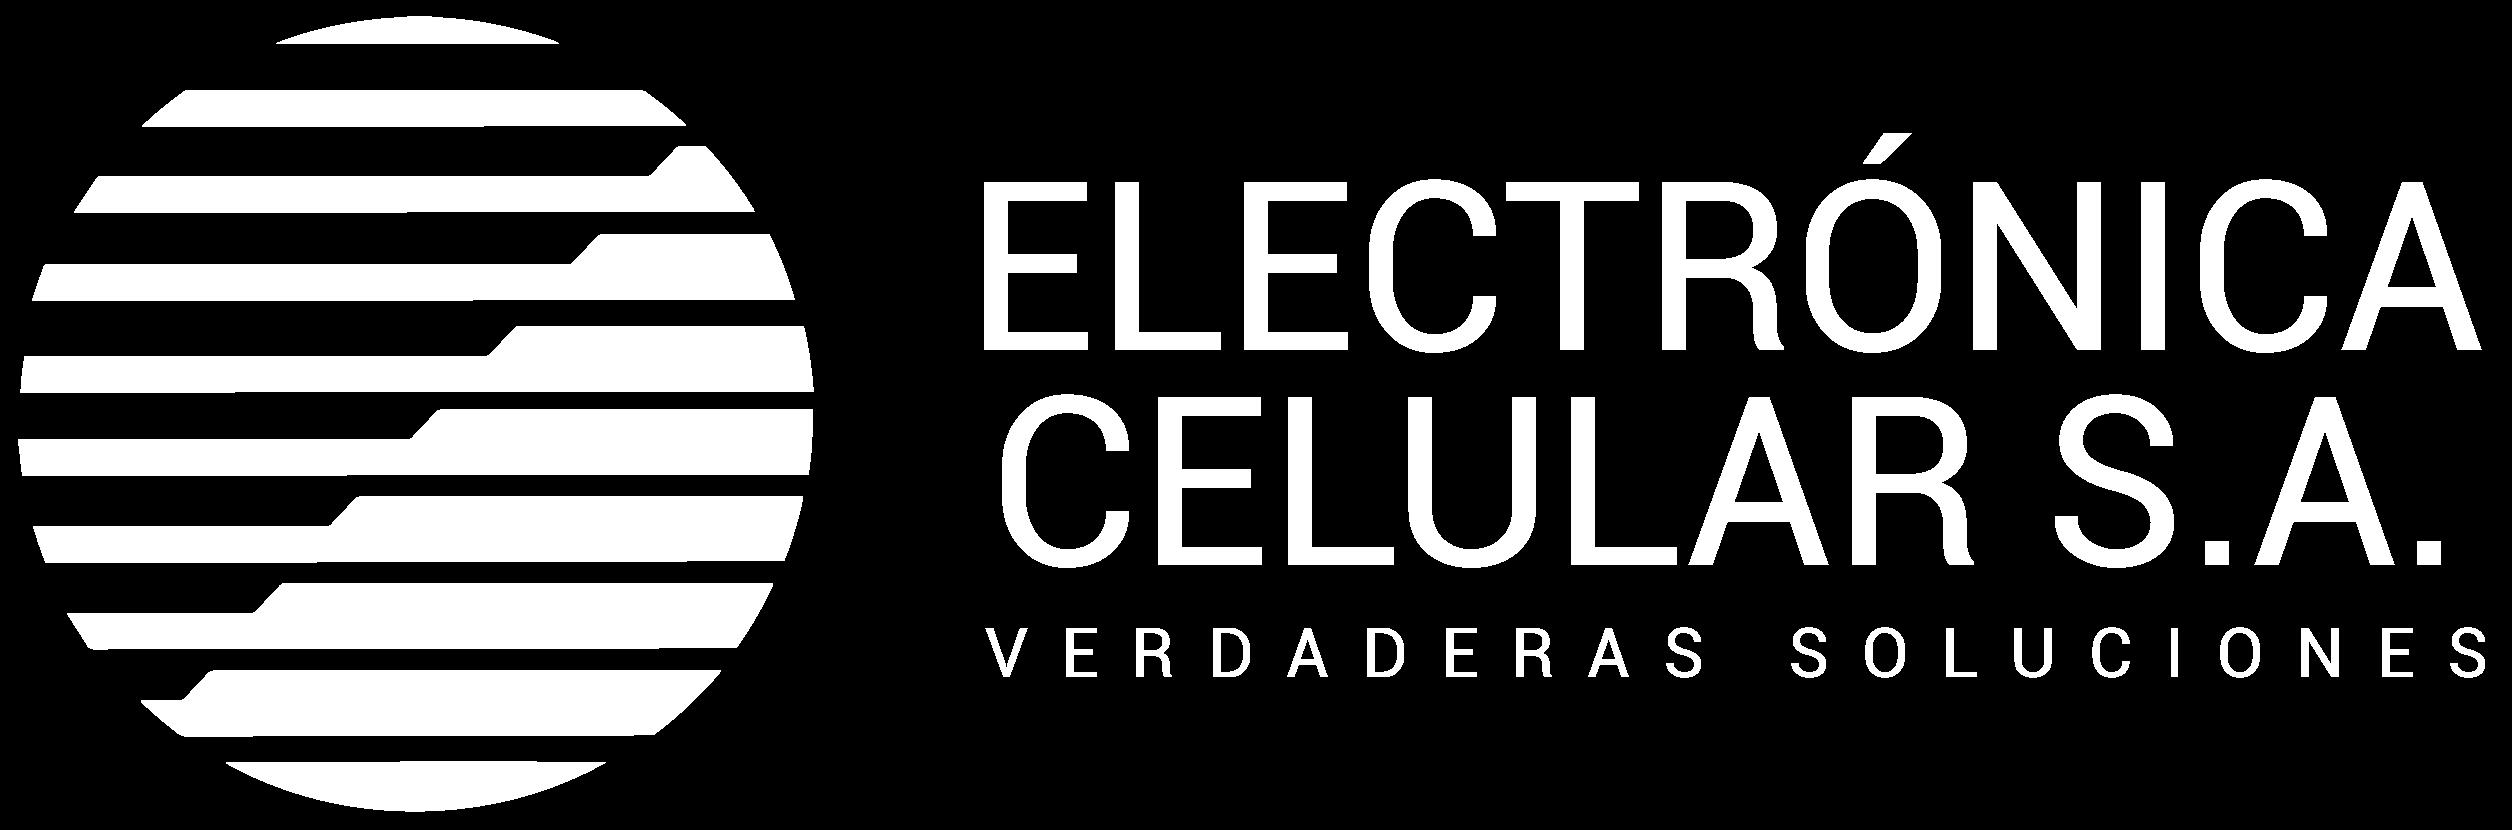 Electrónica Celular